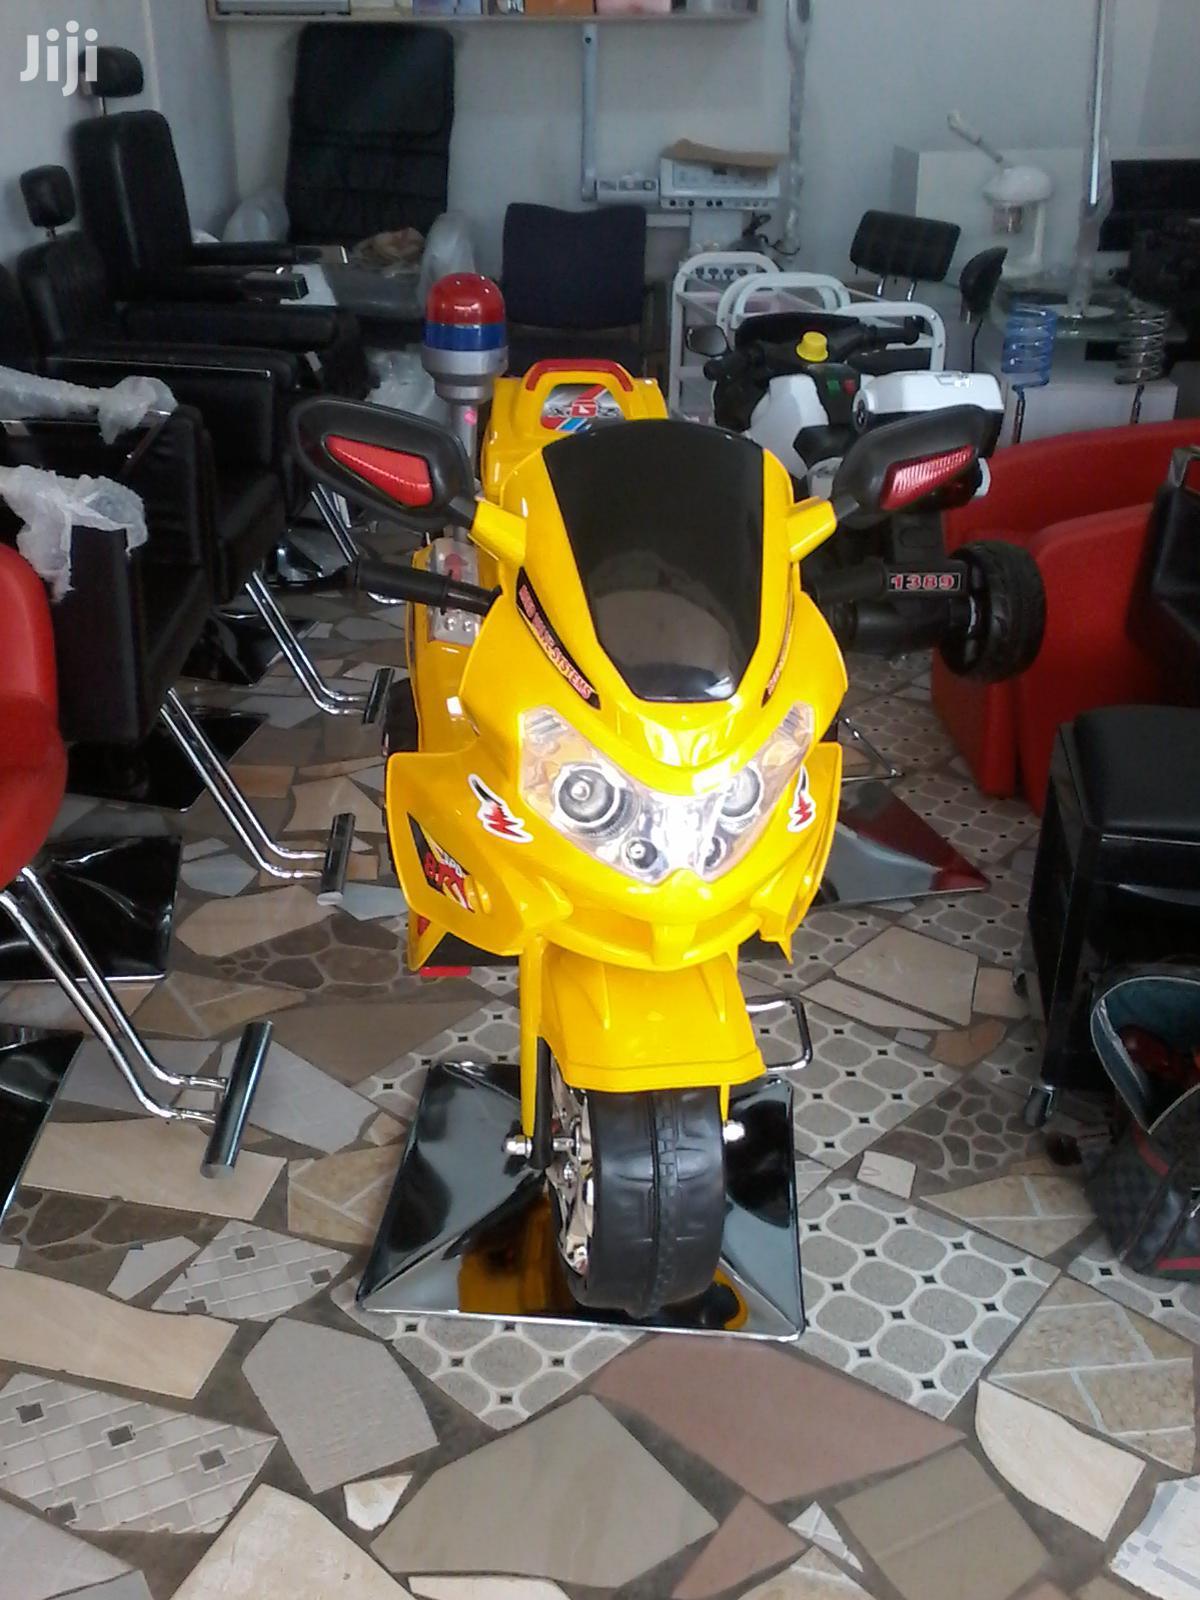 Salon Chairs For Kids | Salon Equipment for sale in Kwashieman, Greater Accra, Ghana